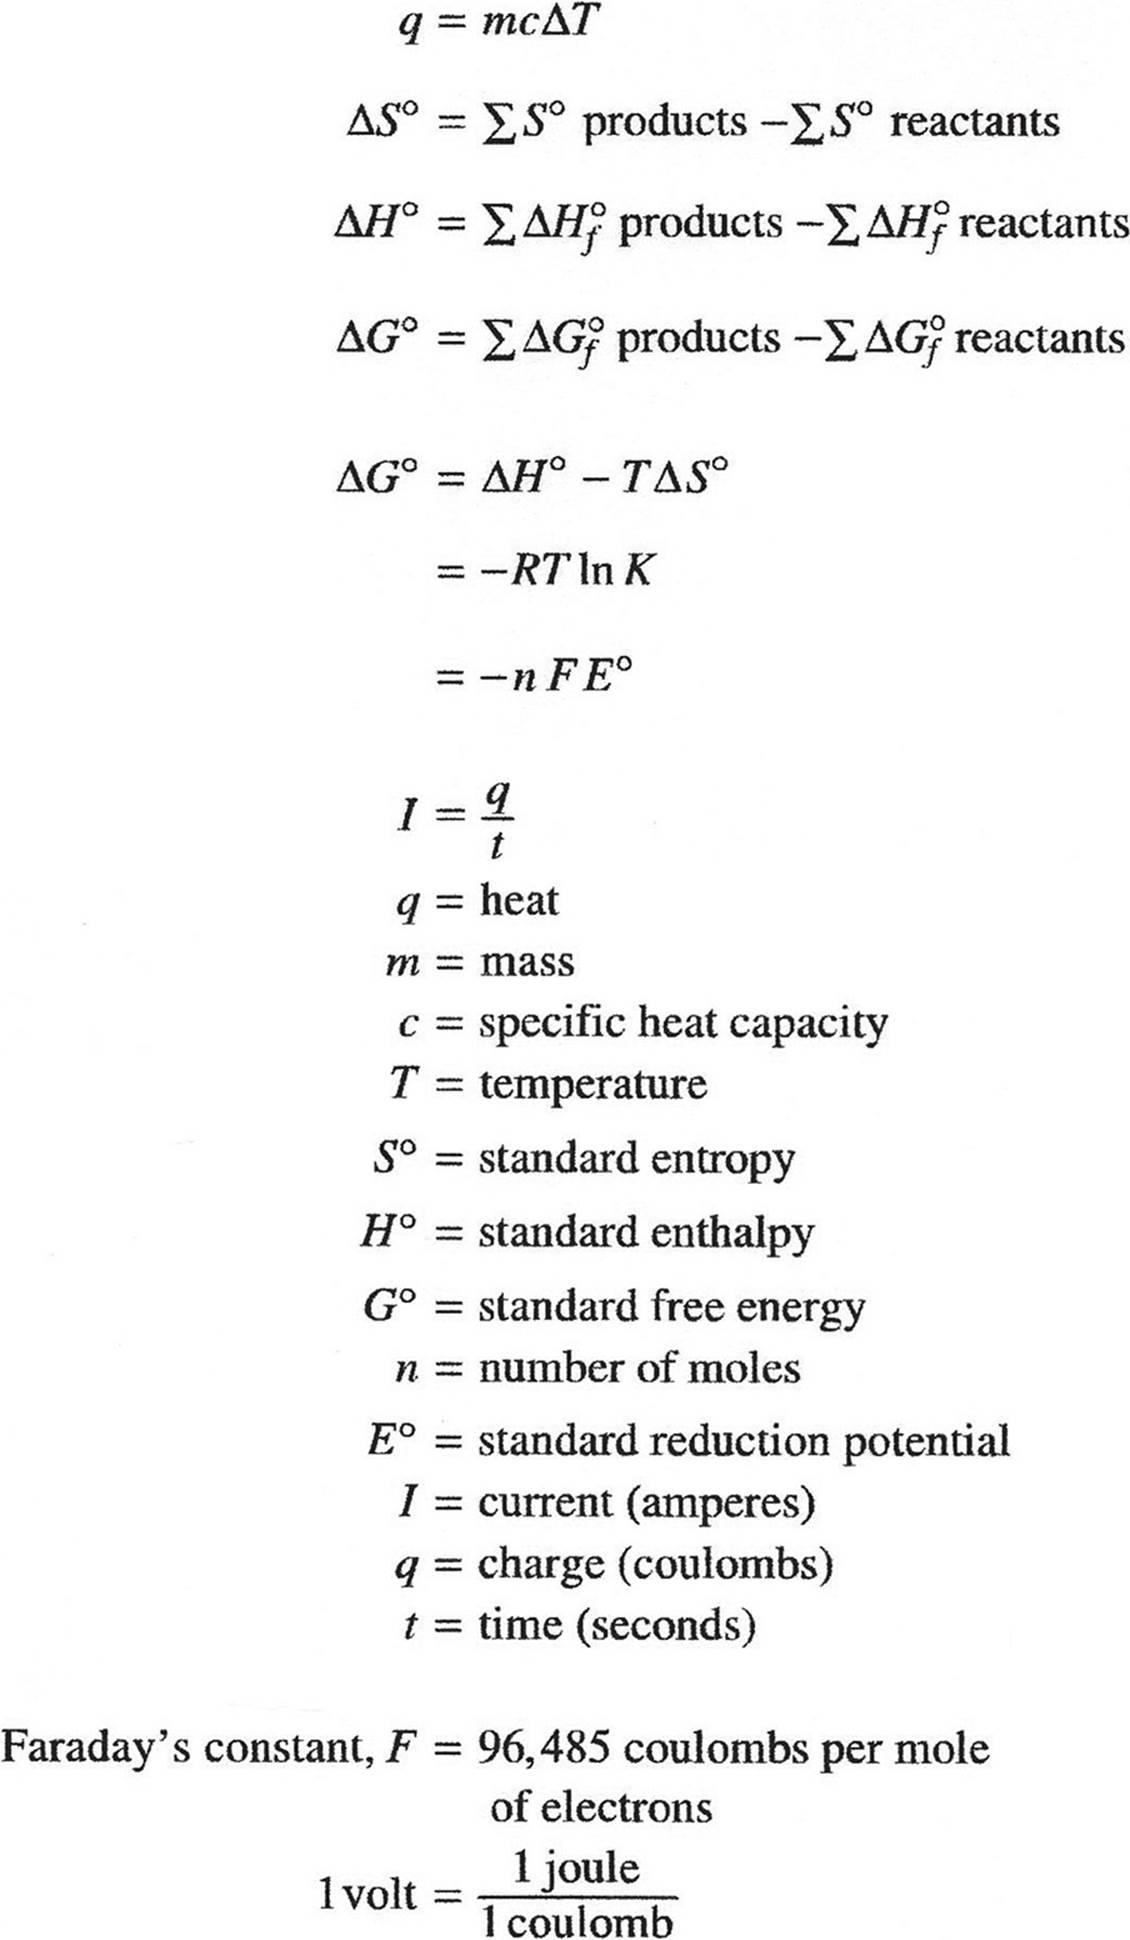 Sat ii chemistry practice test pdf